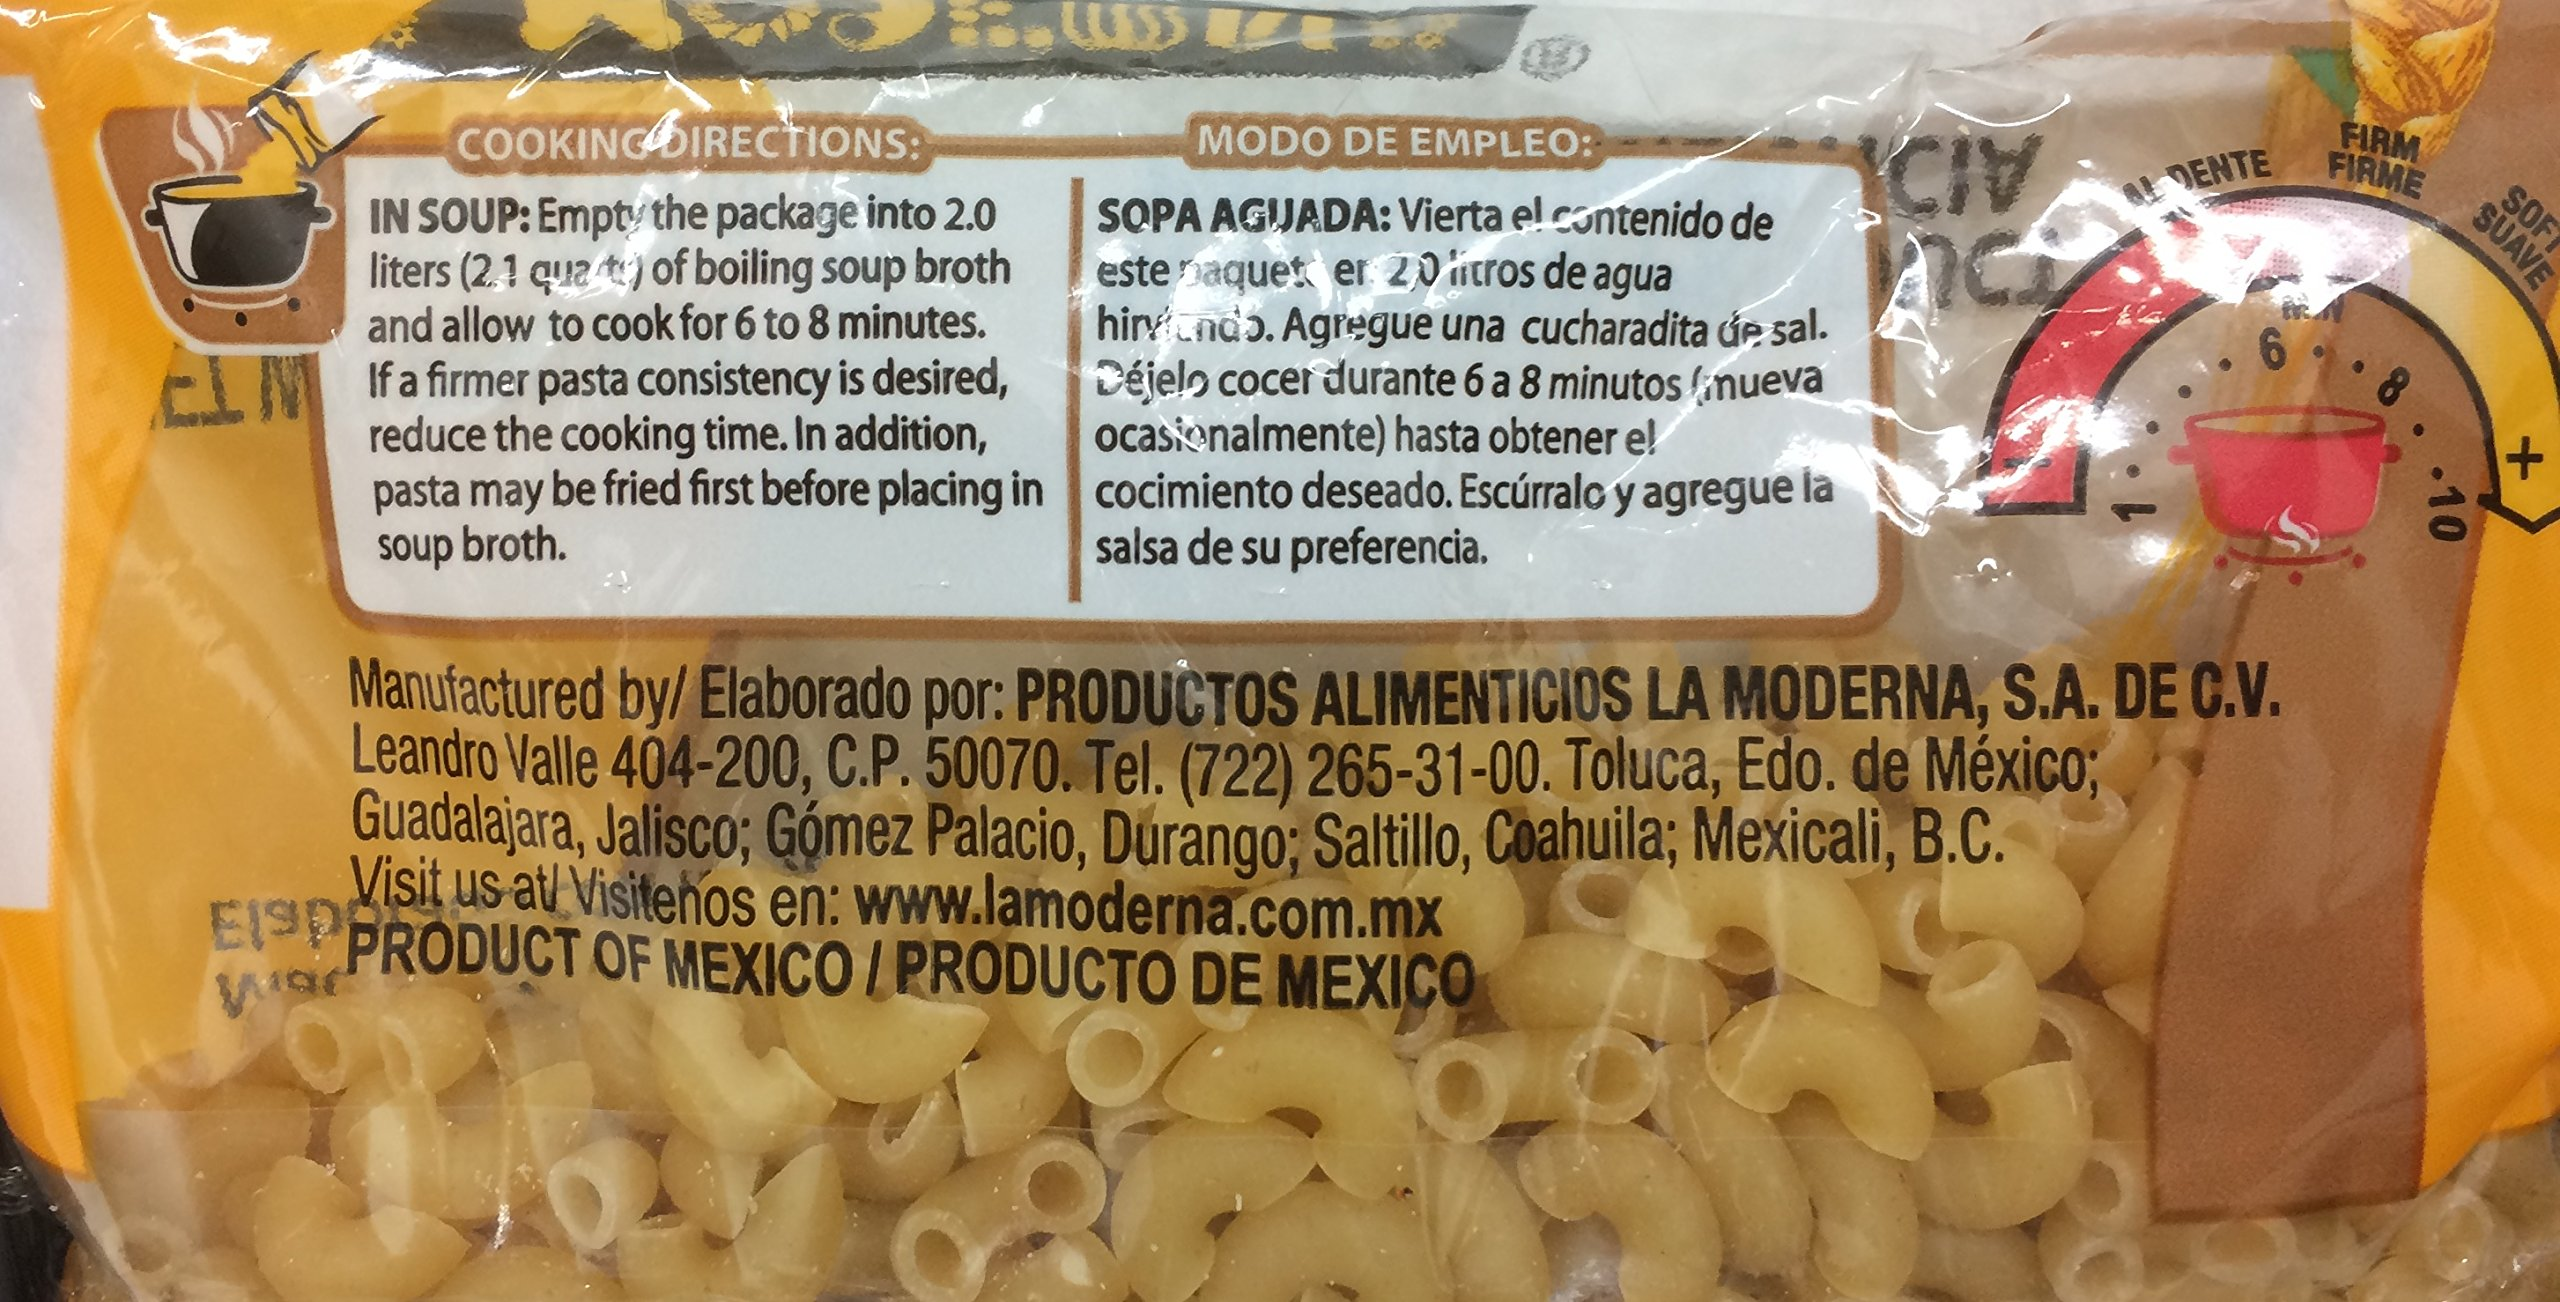 La Moderna Elbows/Codos 100% Duurm Wheat 7.05 Oz. Pack Of 3.